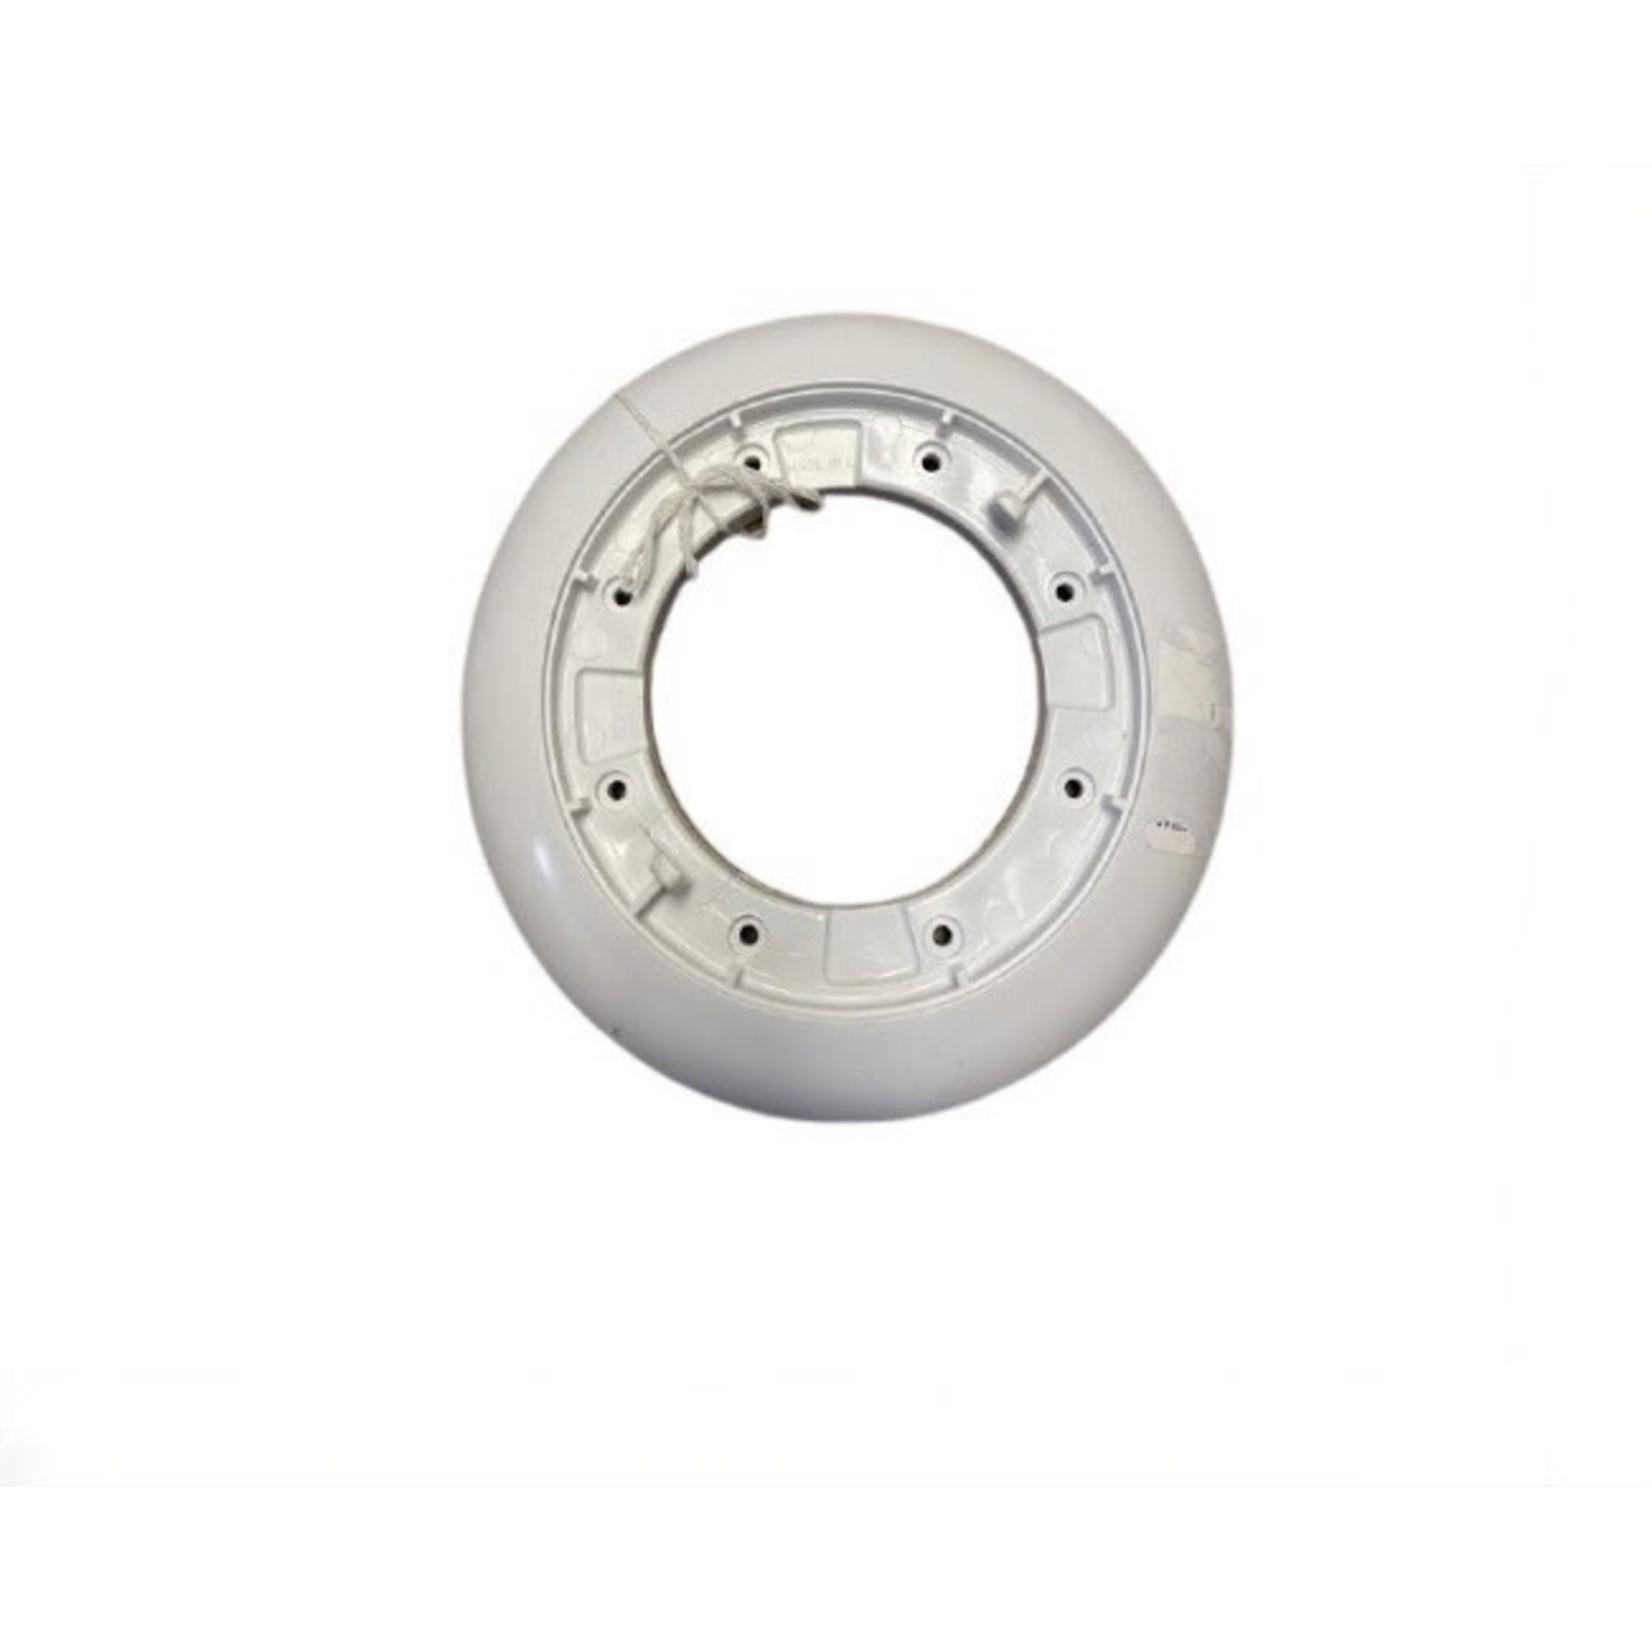 Aqua Lamp AQUA LAMP ADAPTER RING-WHITE